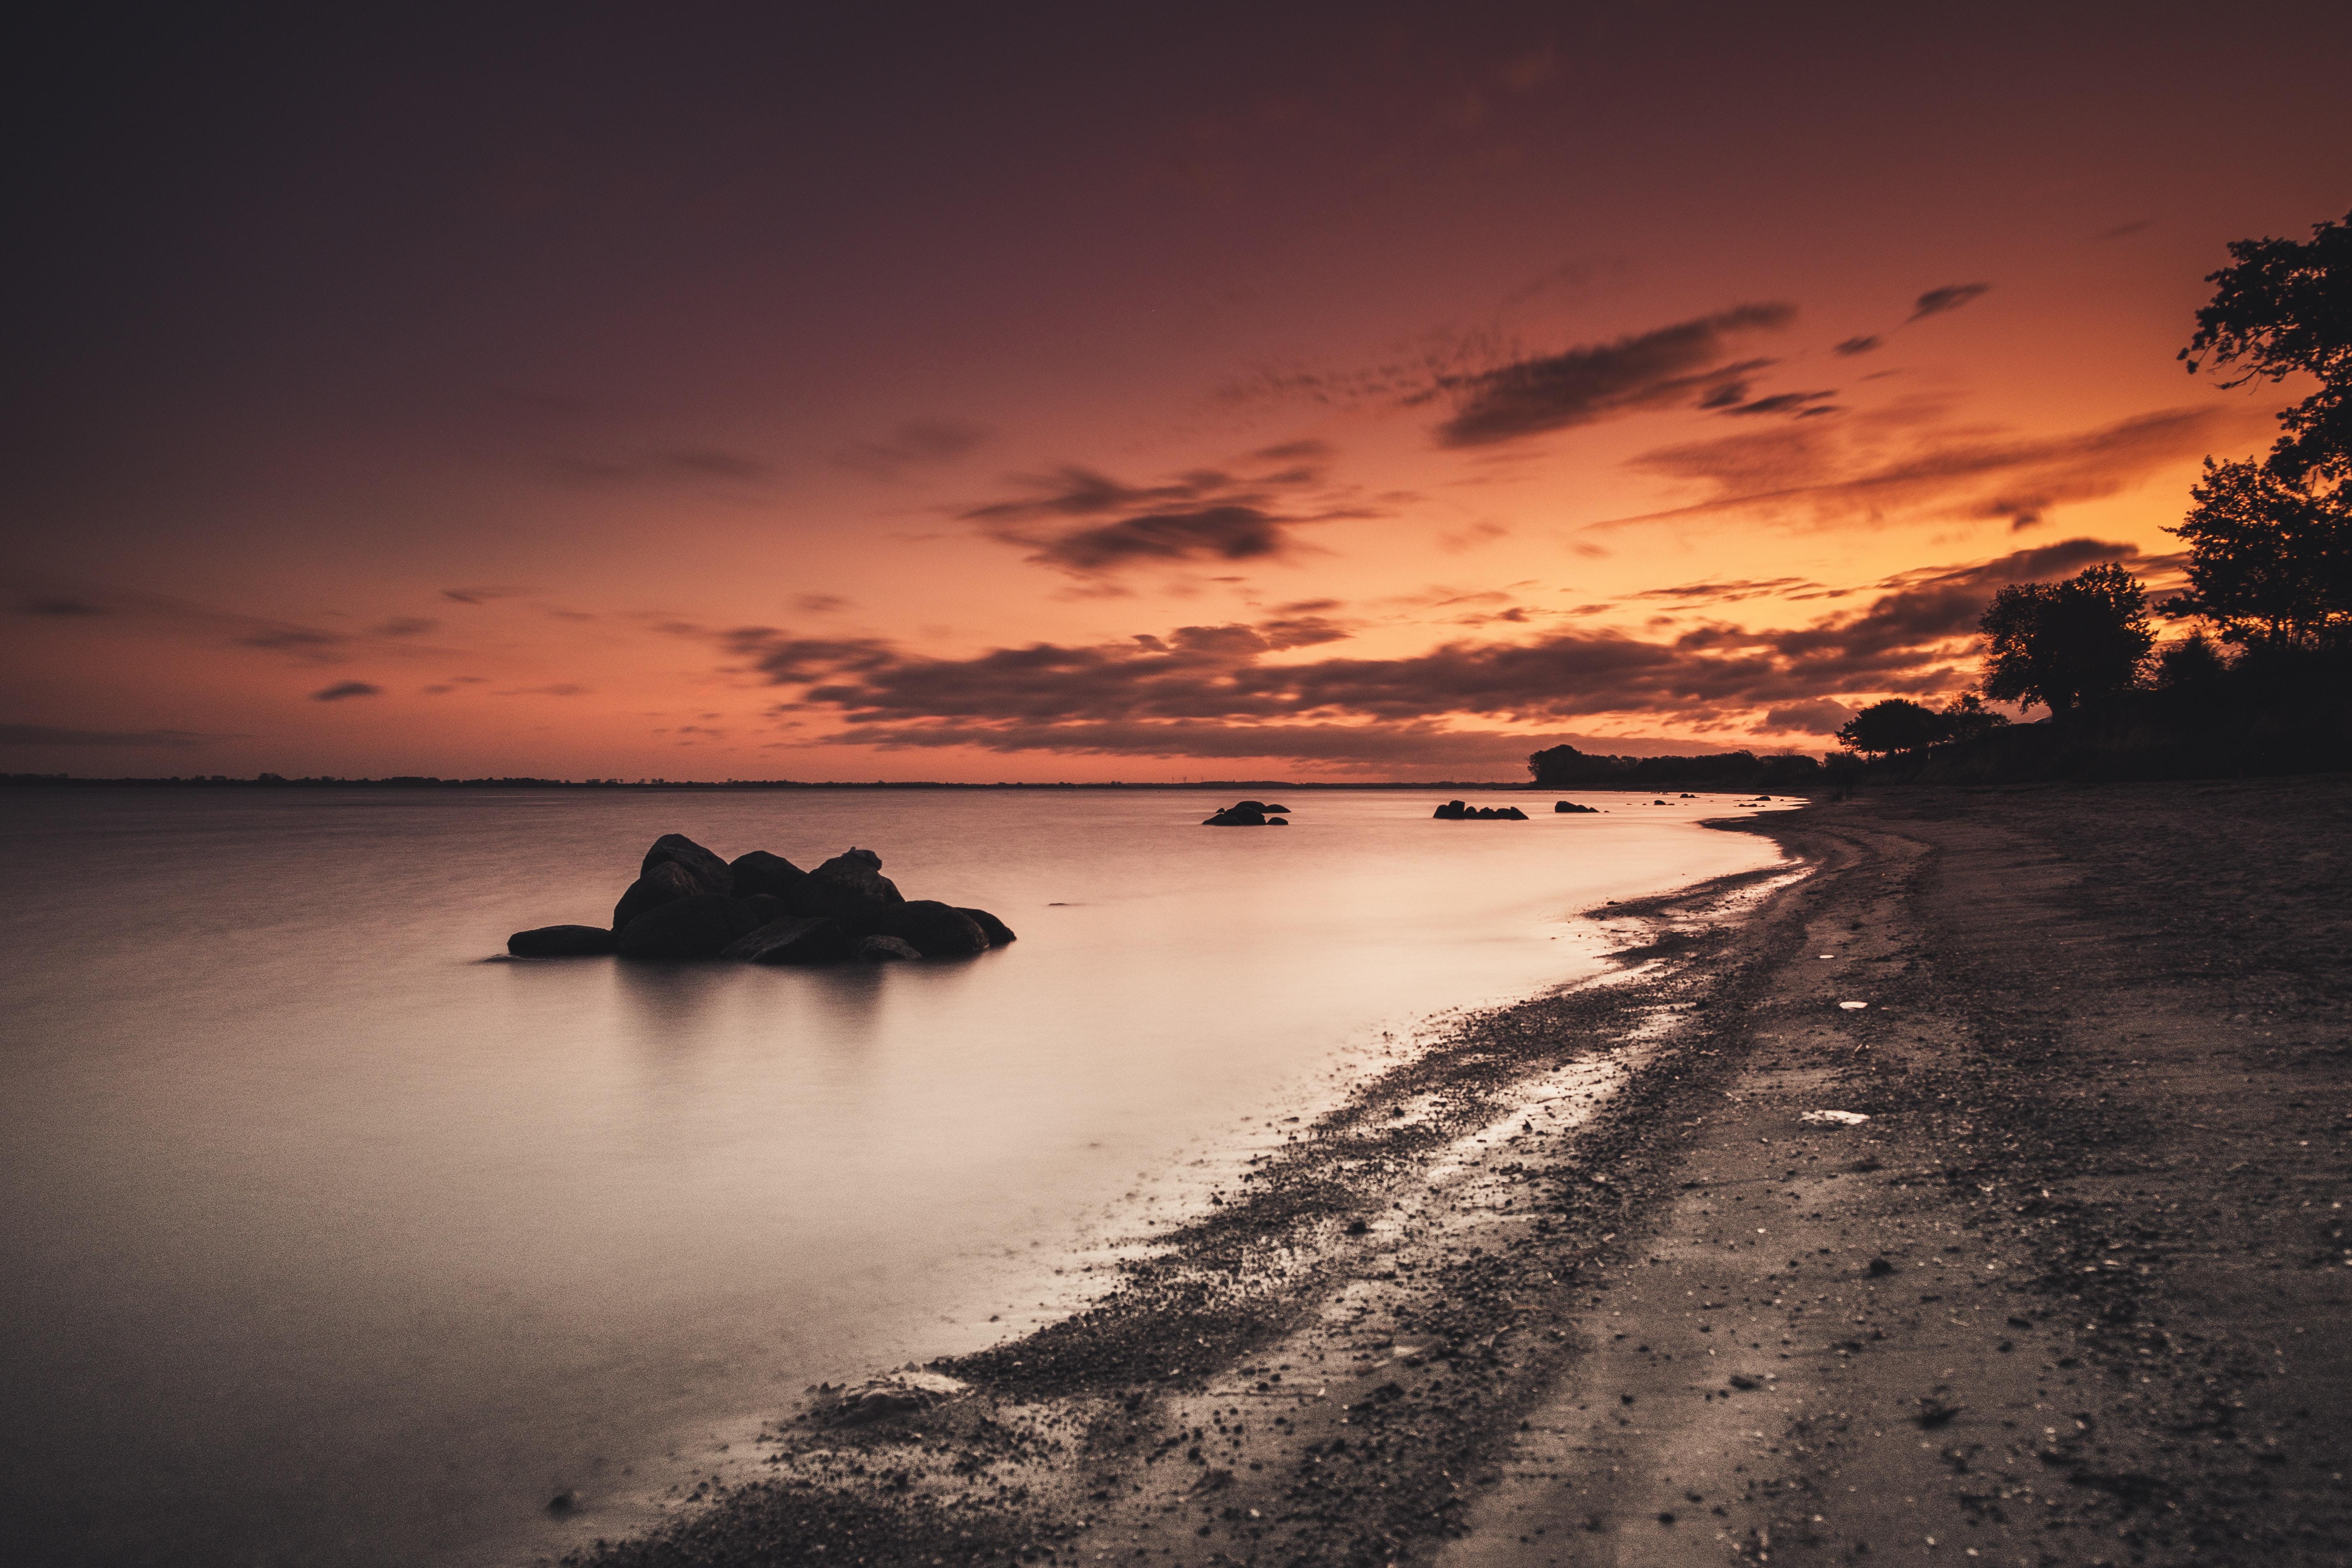 sea shore during golden hour 1574937886 - Sea Shore During Golden Hour -